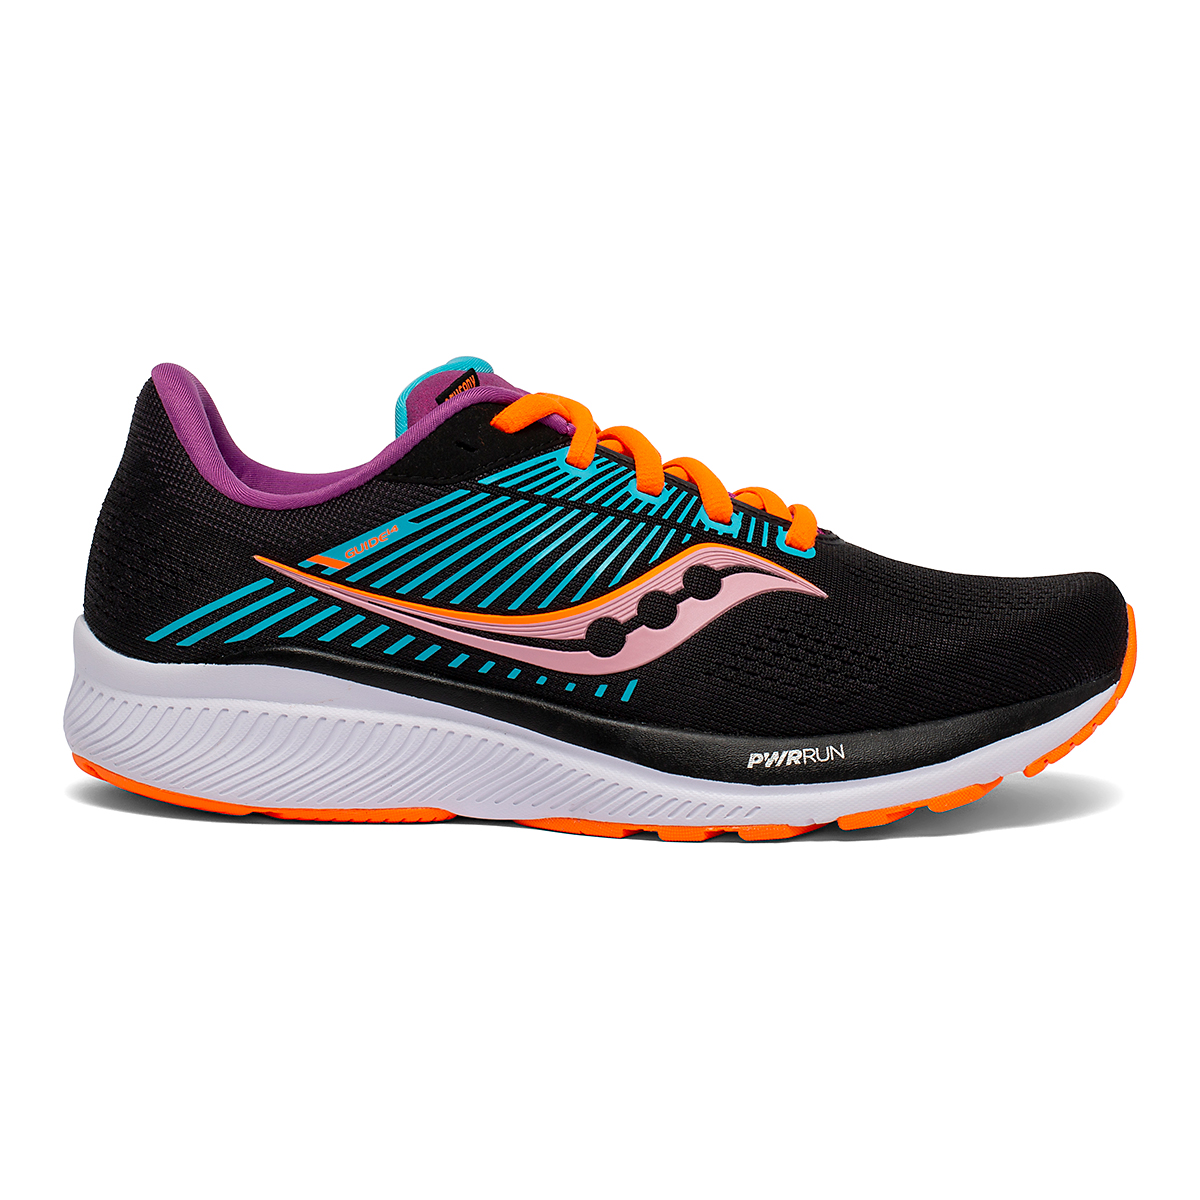 Women's Saucony Guide 14 Running Shoe - Color: Future/Black - Size: 5 - Width: Regular, Future/Black, large, image 1